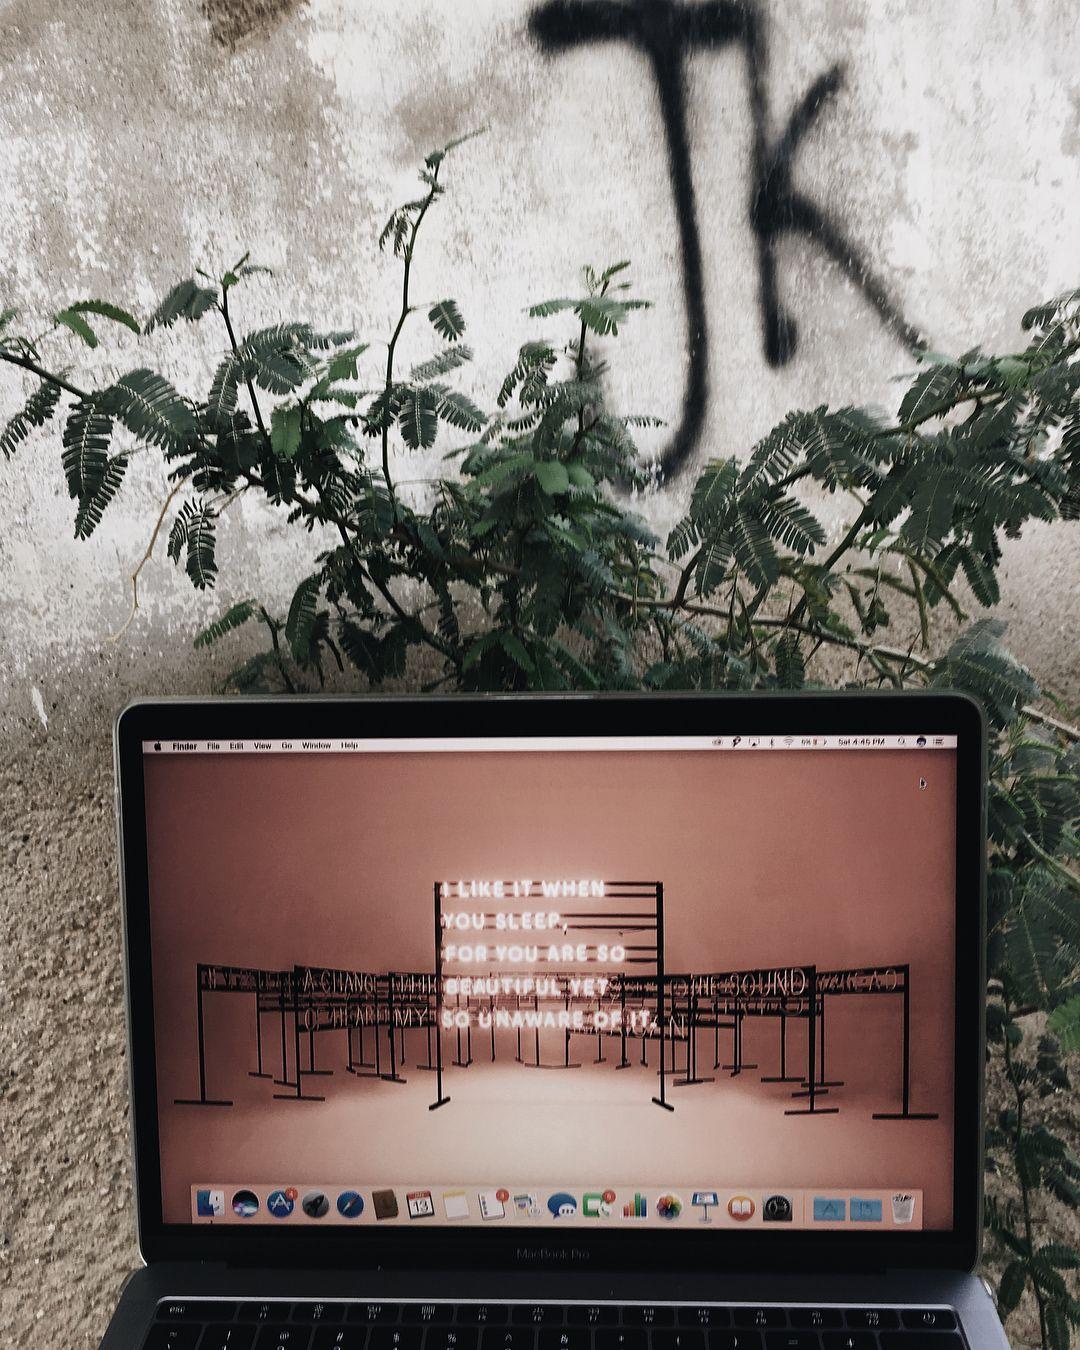 Macbook Air Wallpaper Aesthetic : macbook, wallpaper, aesthetic, Wallpaper, Macbook, Indie, Grunge, Hipsters, Aesthetic, Instagram, Creative, Photogr…, Wallpaper,